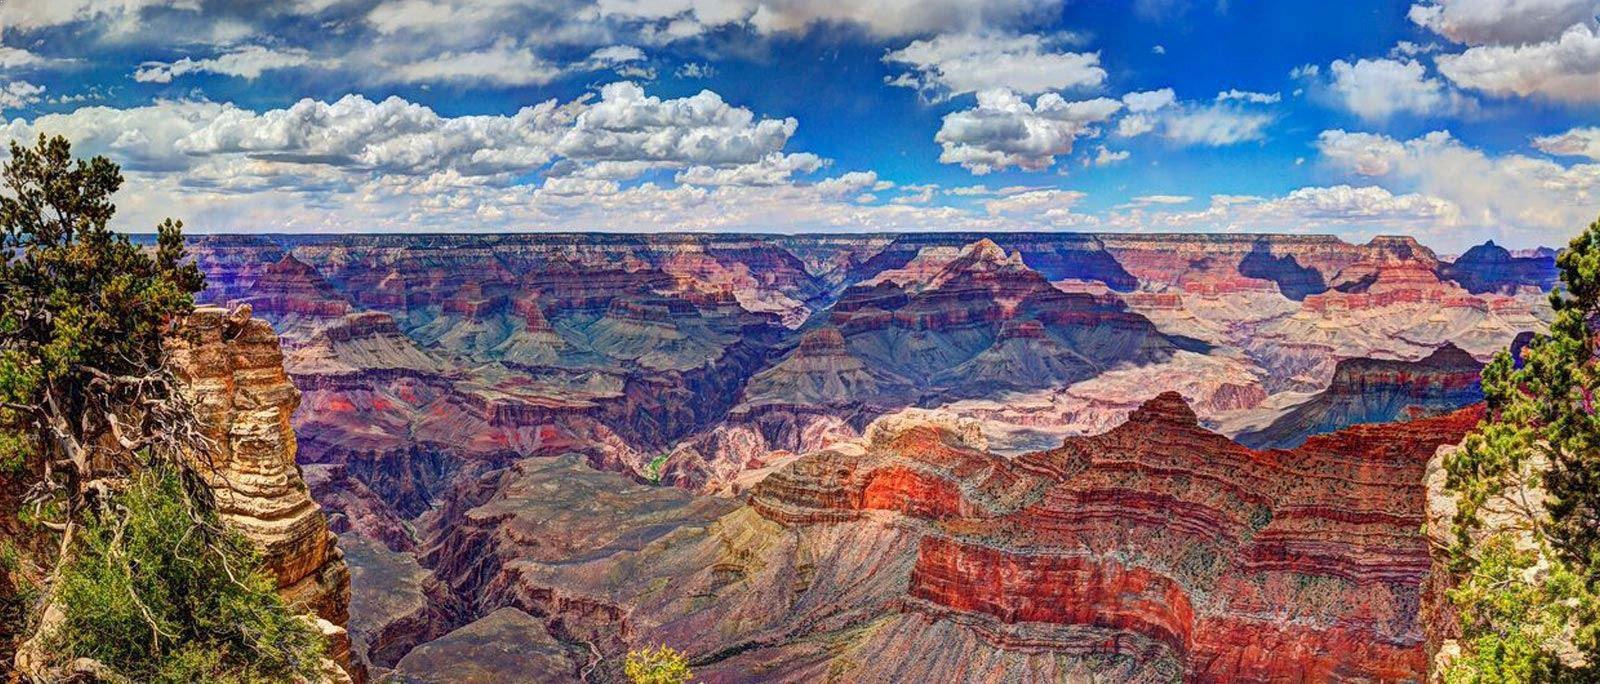 grand canyon hotels grand